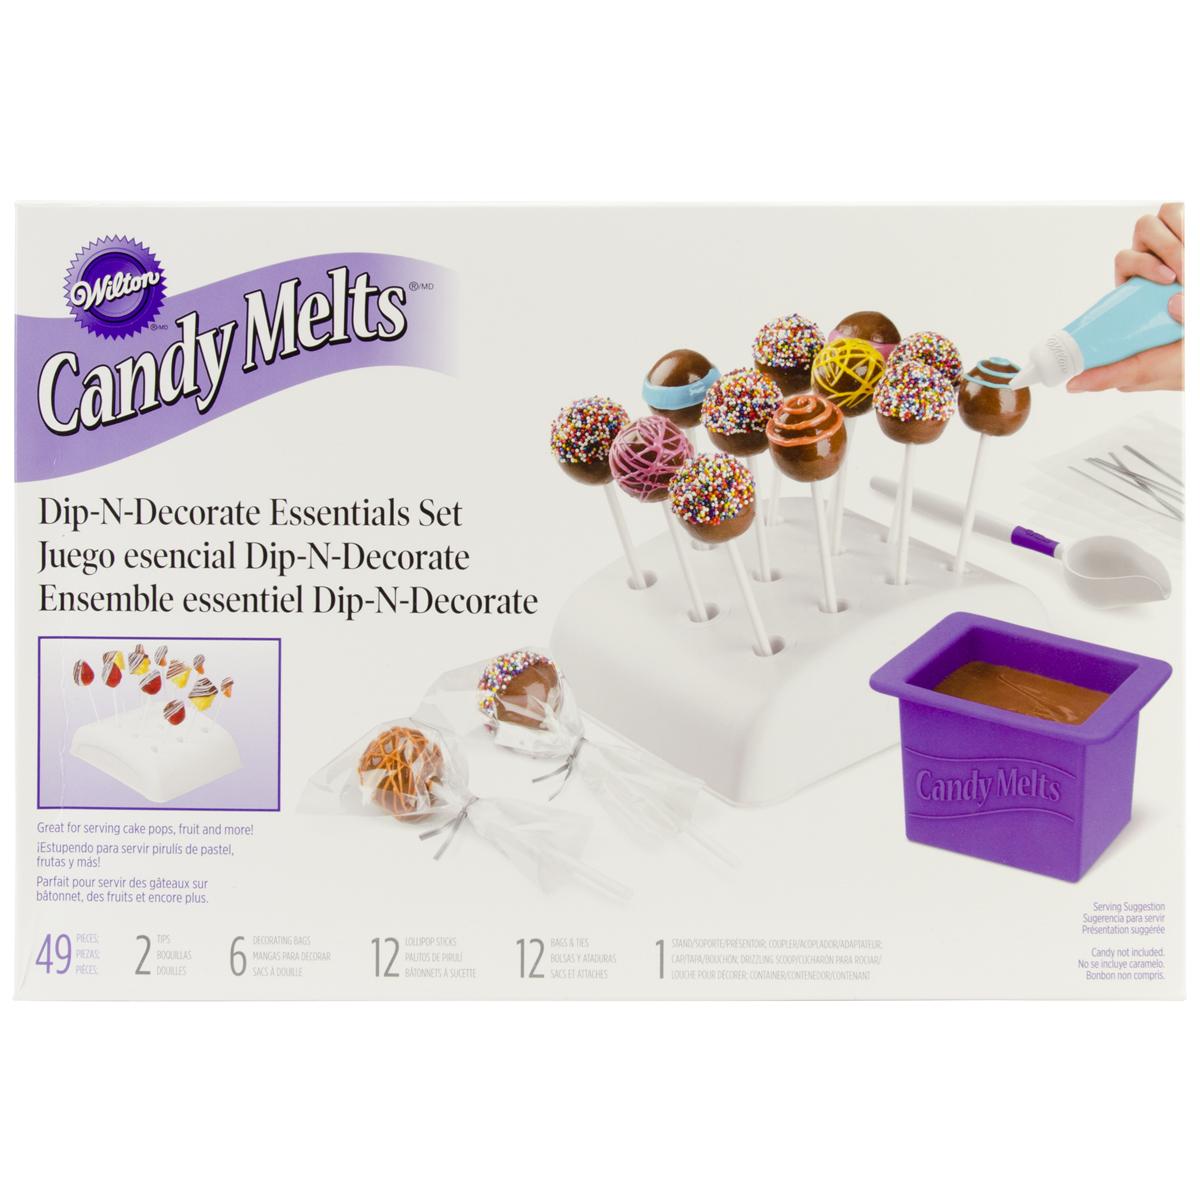 Candy Dip-N-Decorate Essentials Kit